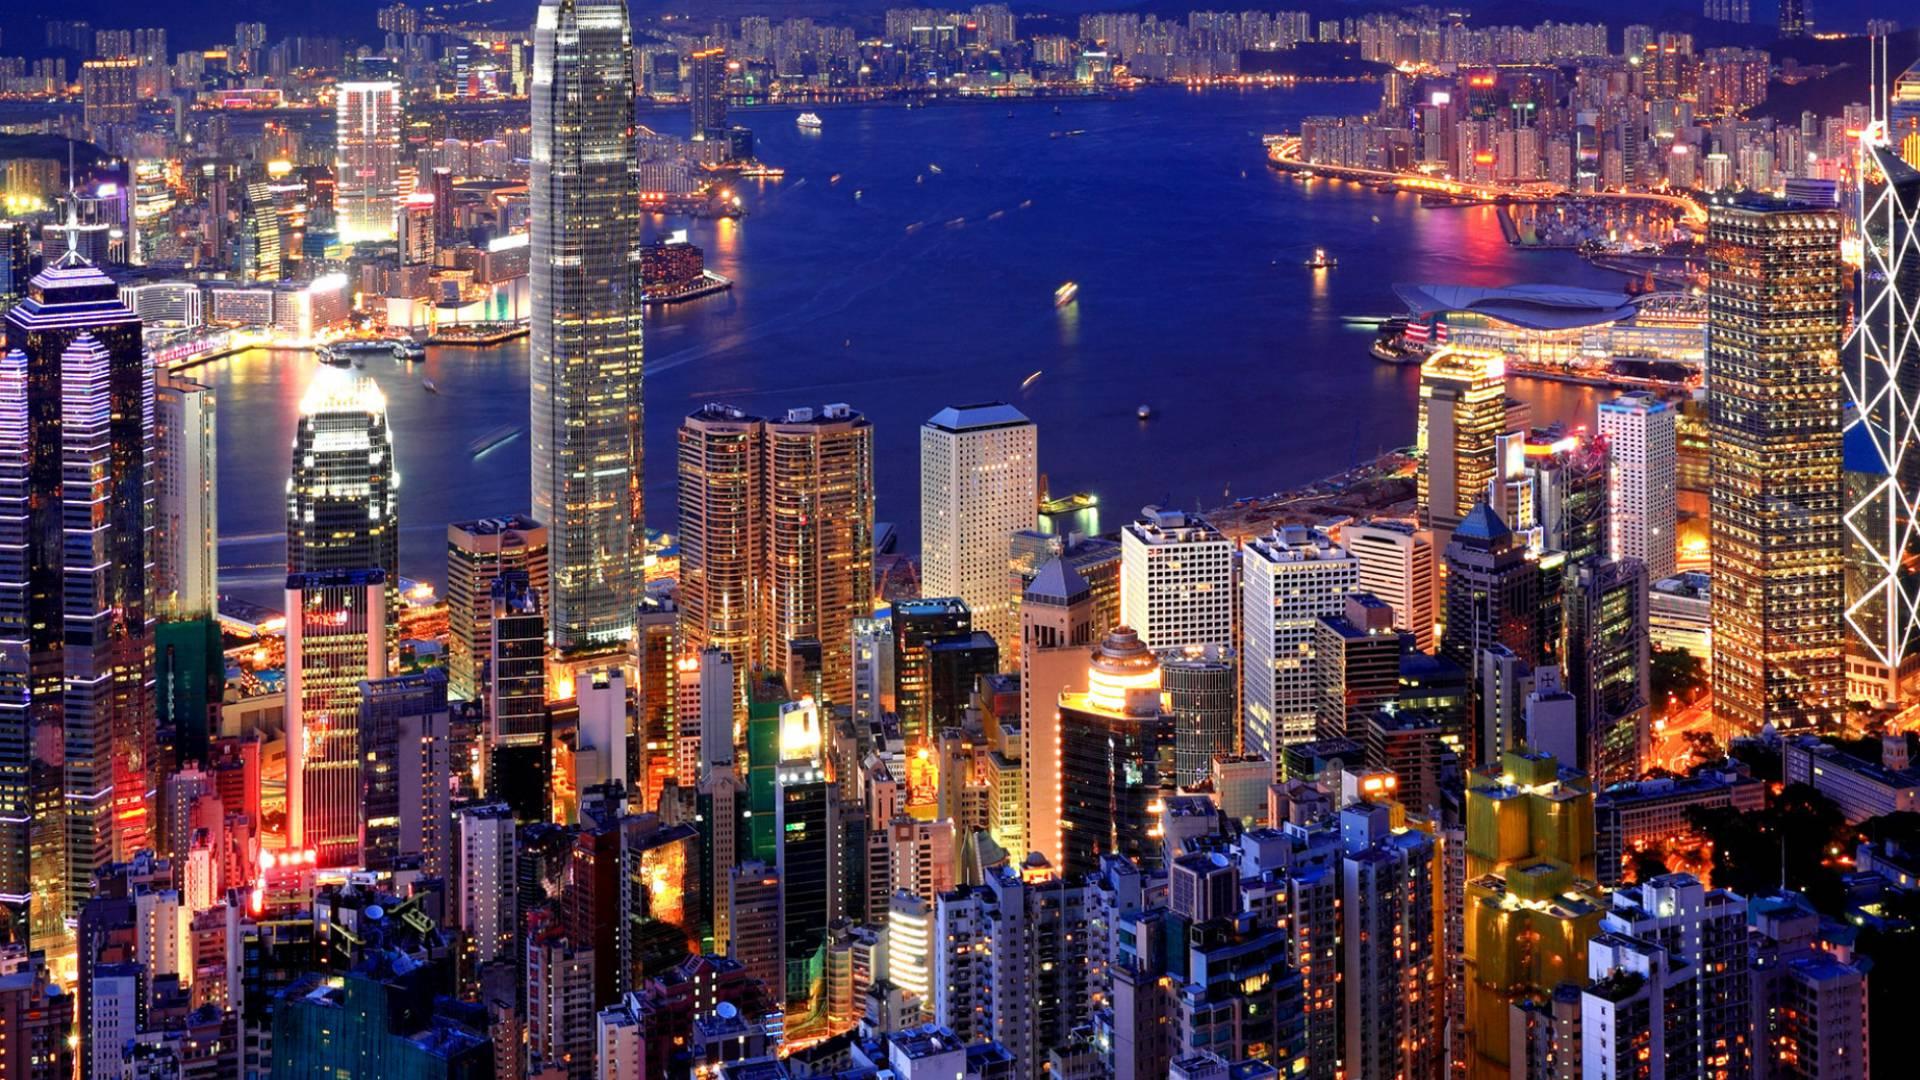 13.-15.02.2012 - Trainings und Designer Presentations in HongKong